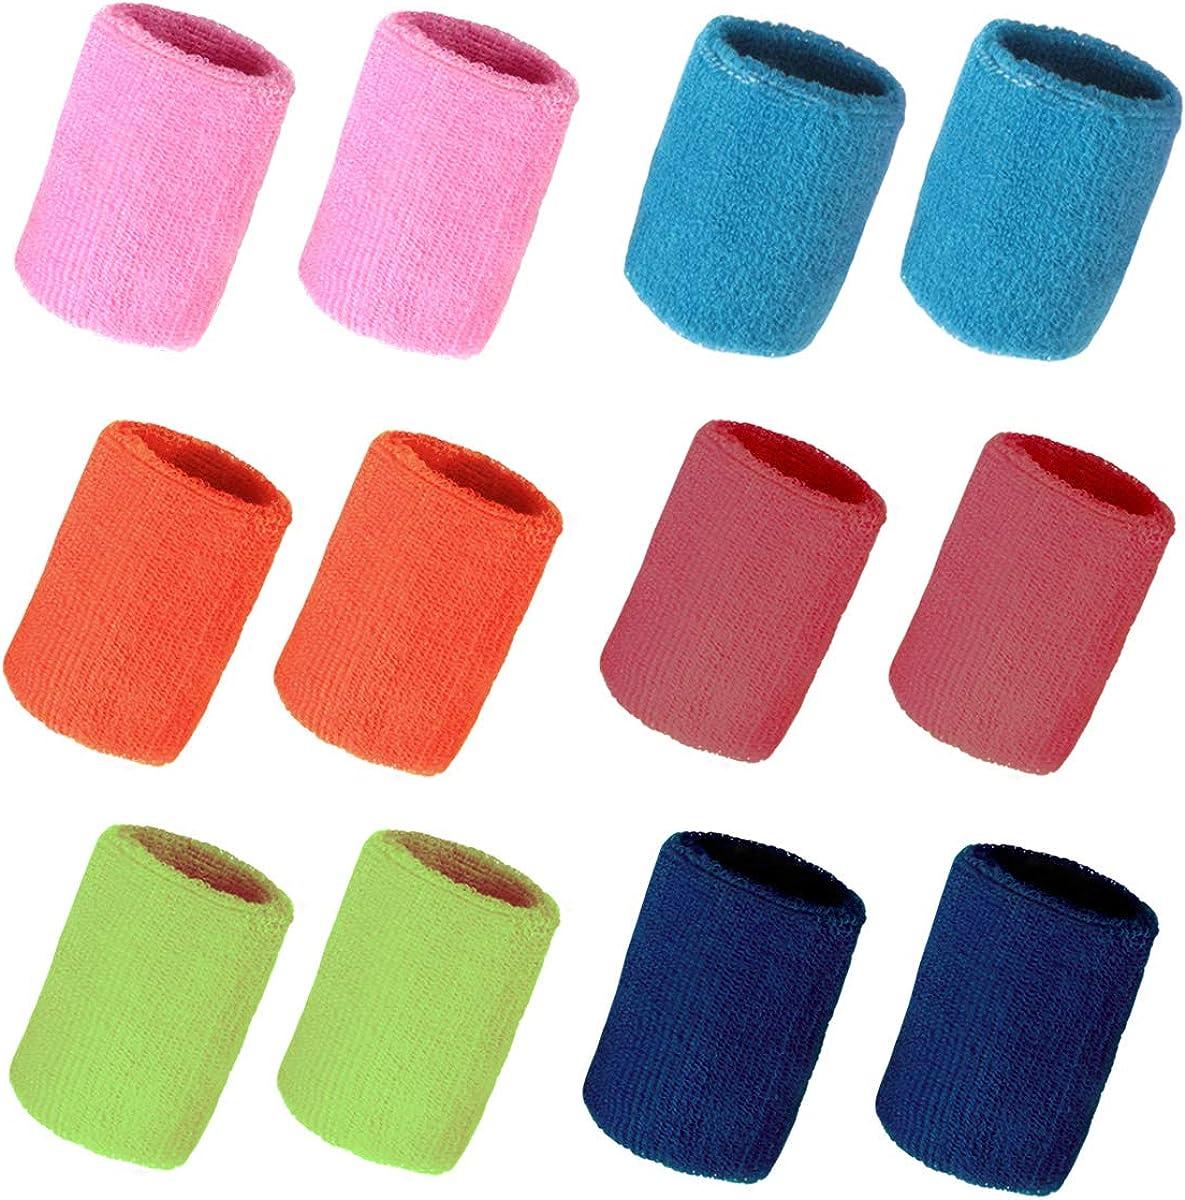 Hapy Shop 12 Pack Colorful Sport trust Athletic Bargain Terr Wristbands Cotton